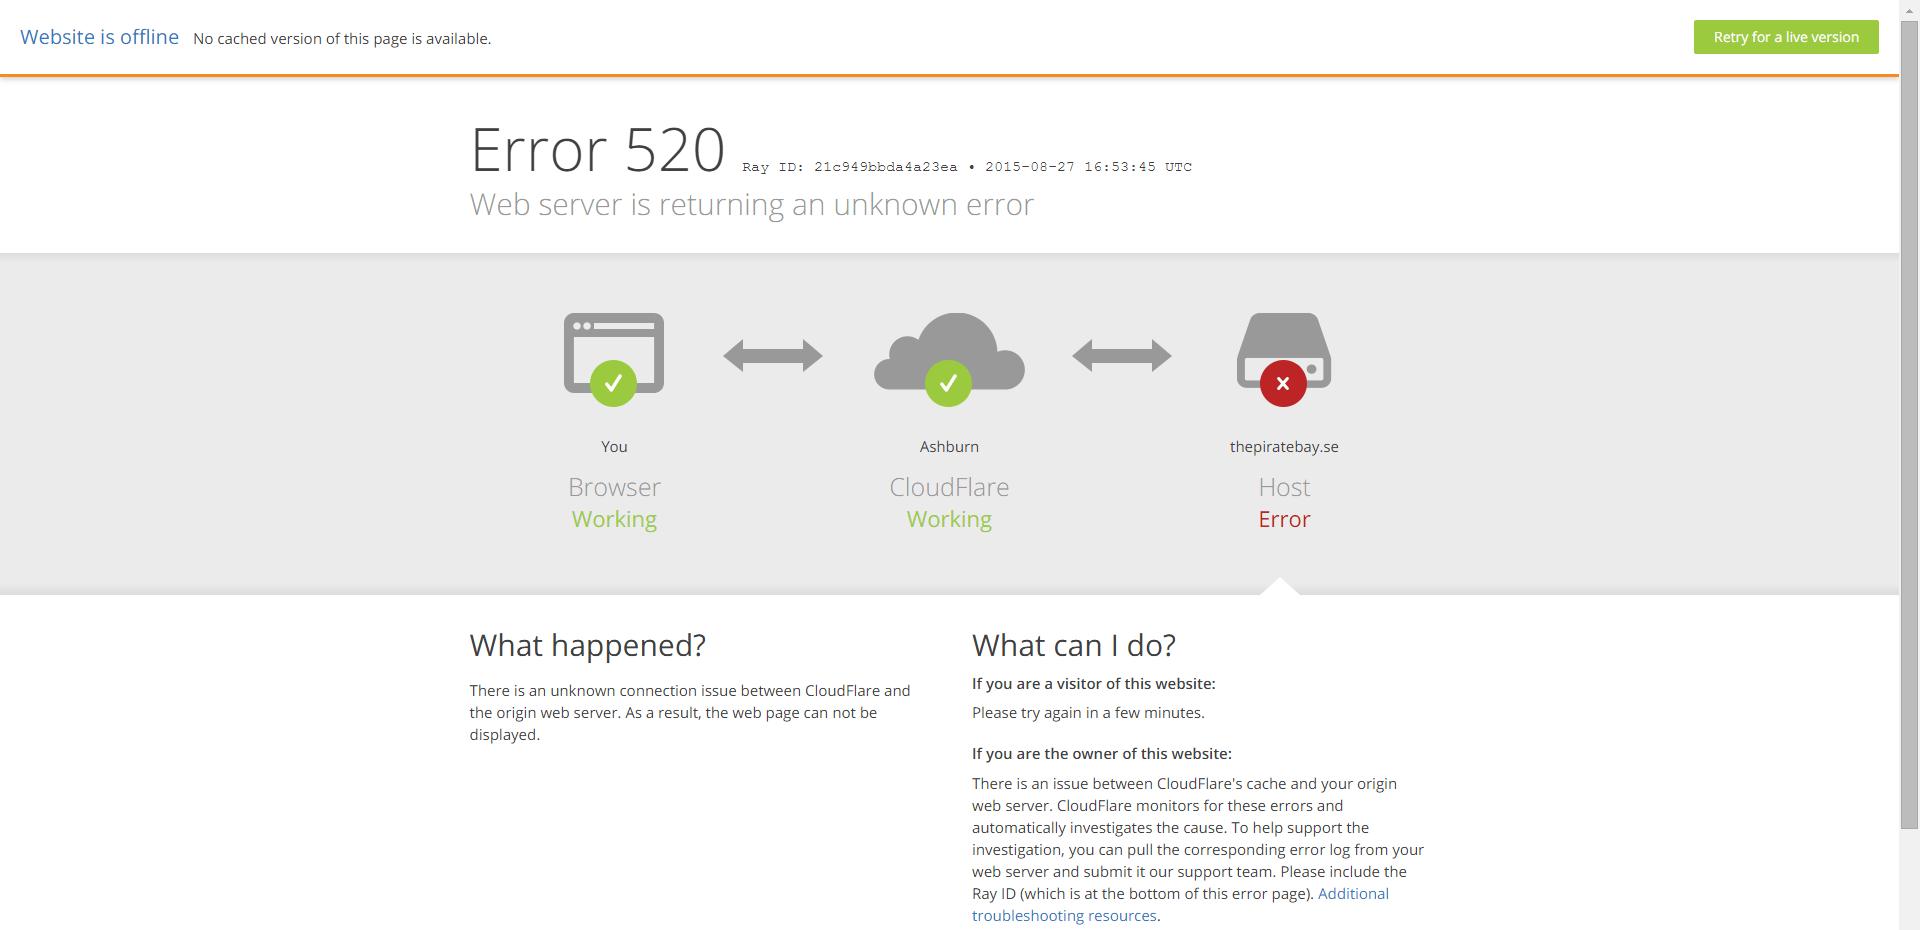 tpb_down_error_520